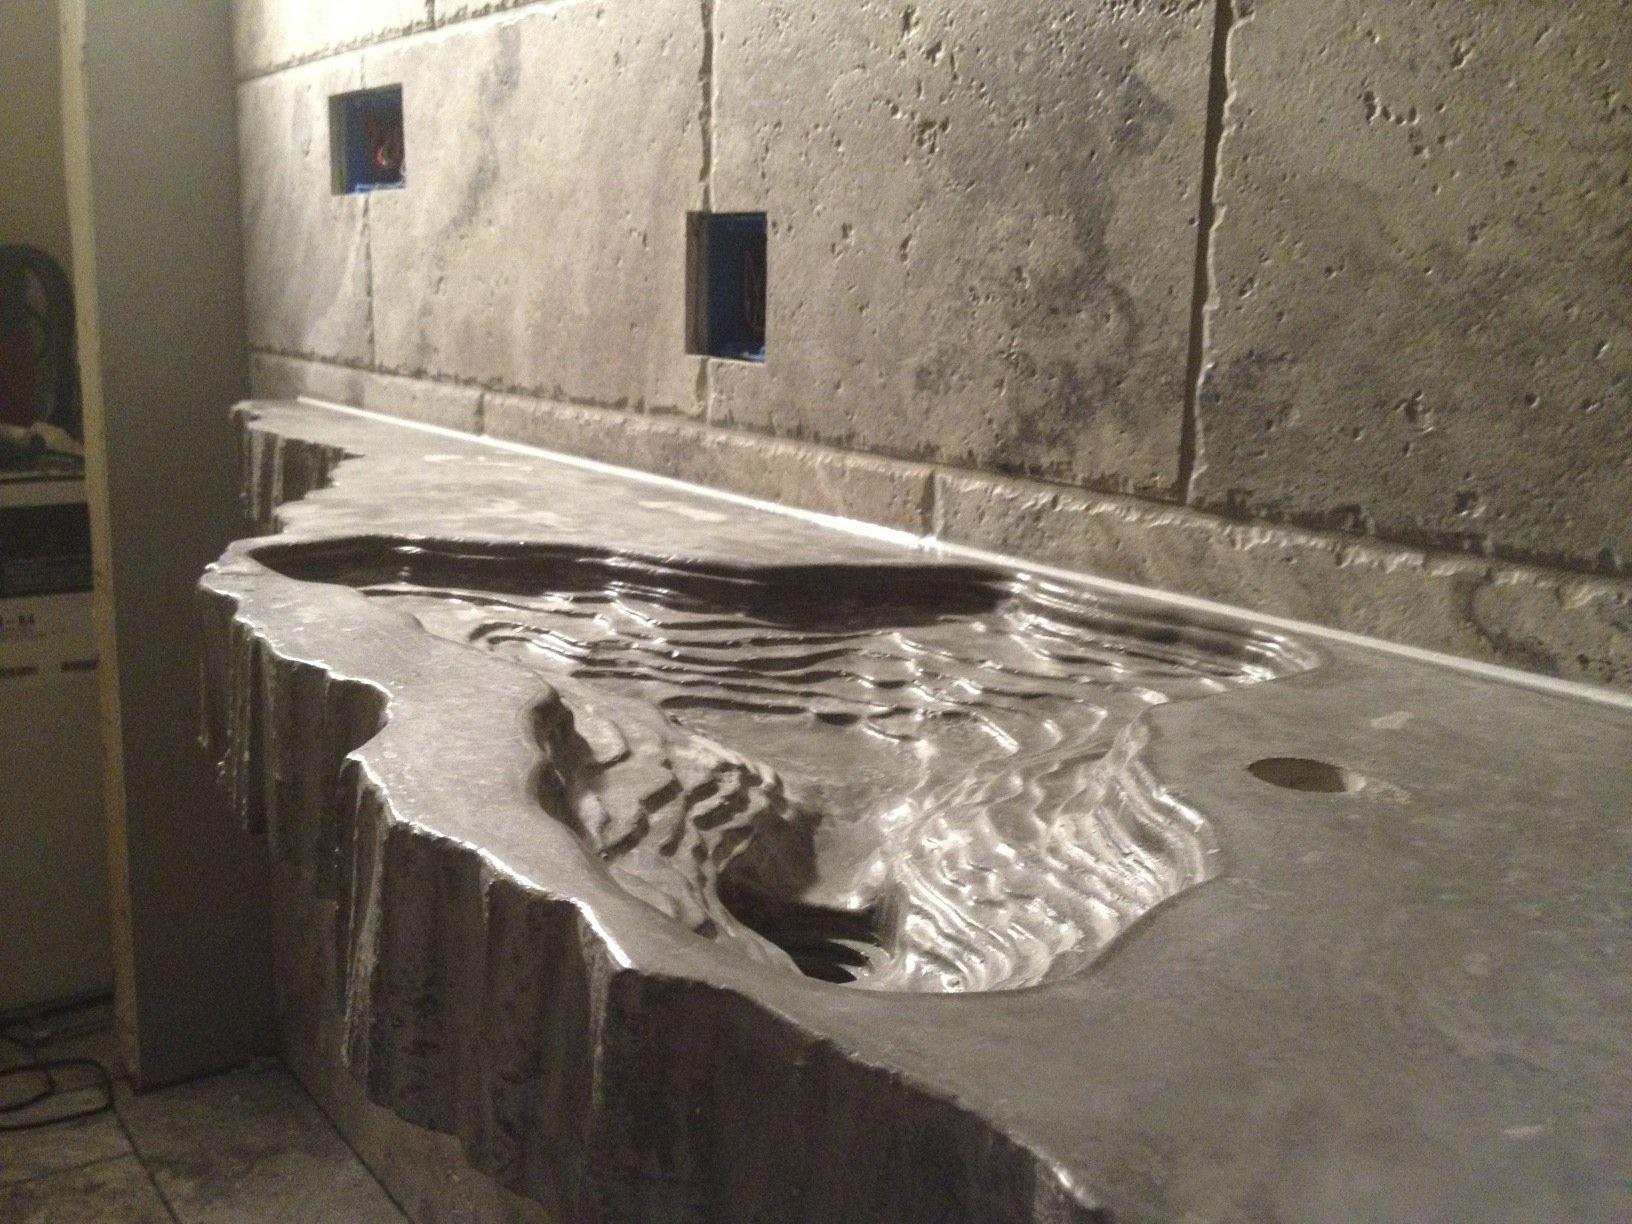 terrazzo remarkable countertops worktop s home marble alternative kitchen white granite improvement jig prices